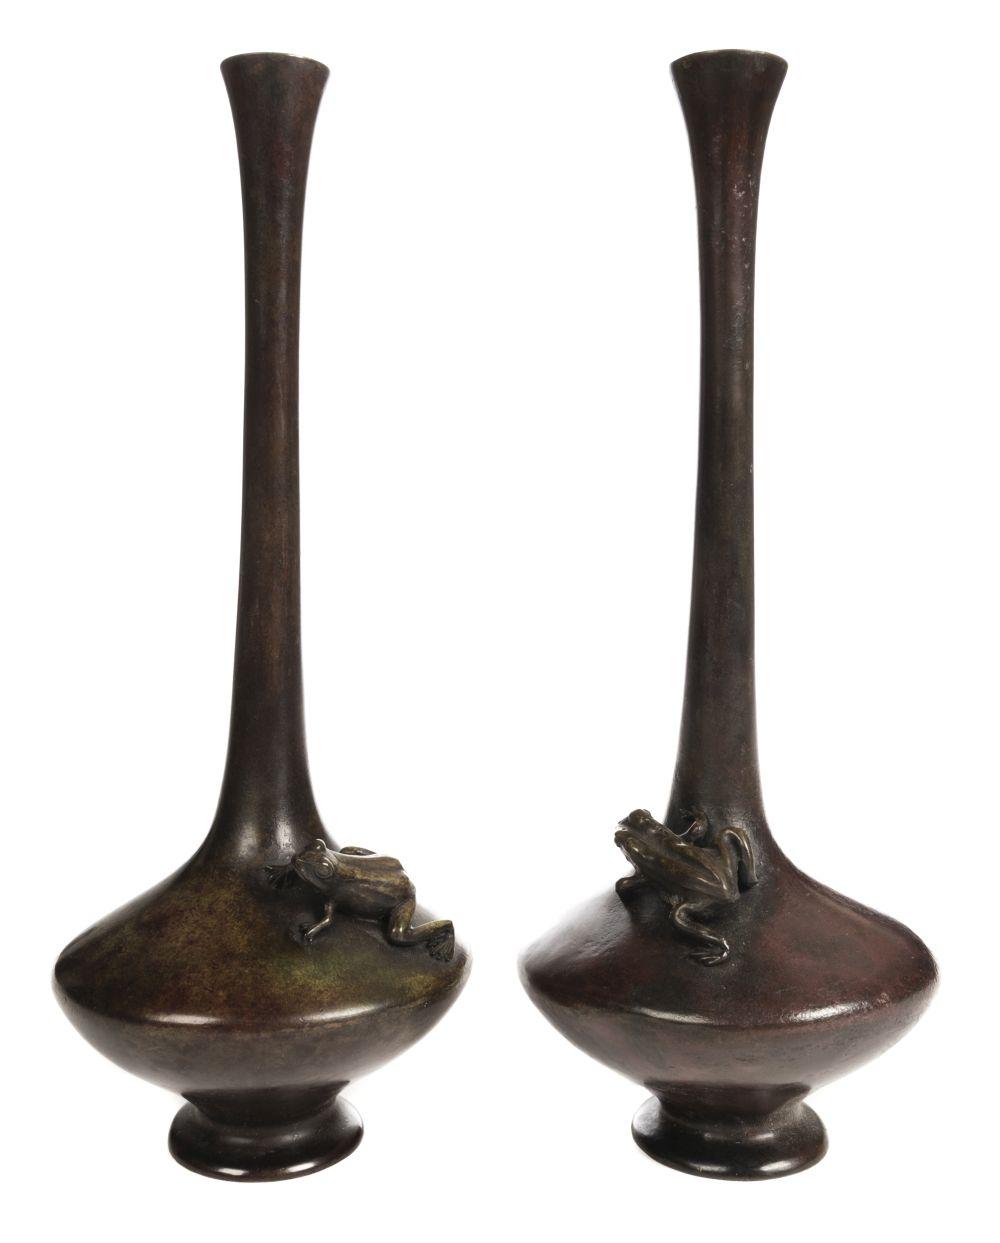 * Vases. Pair of Japanese bronze vases, Meiji period